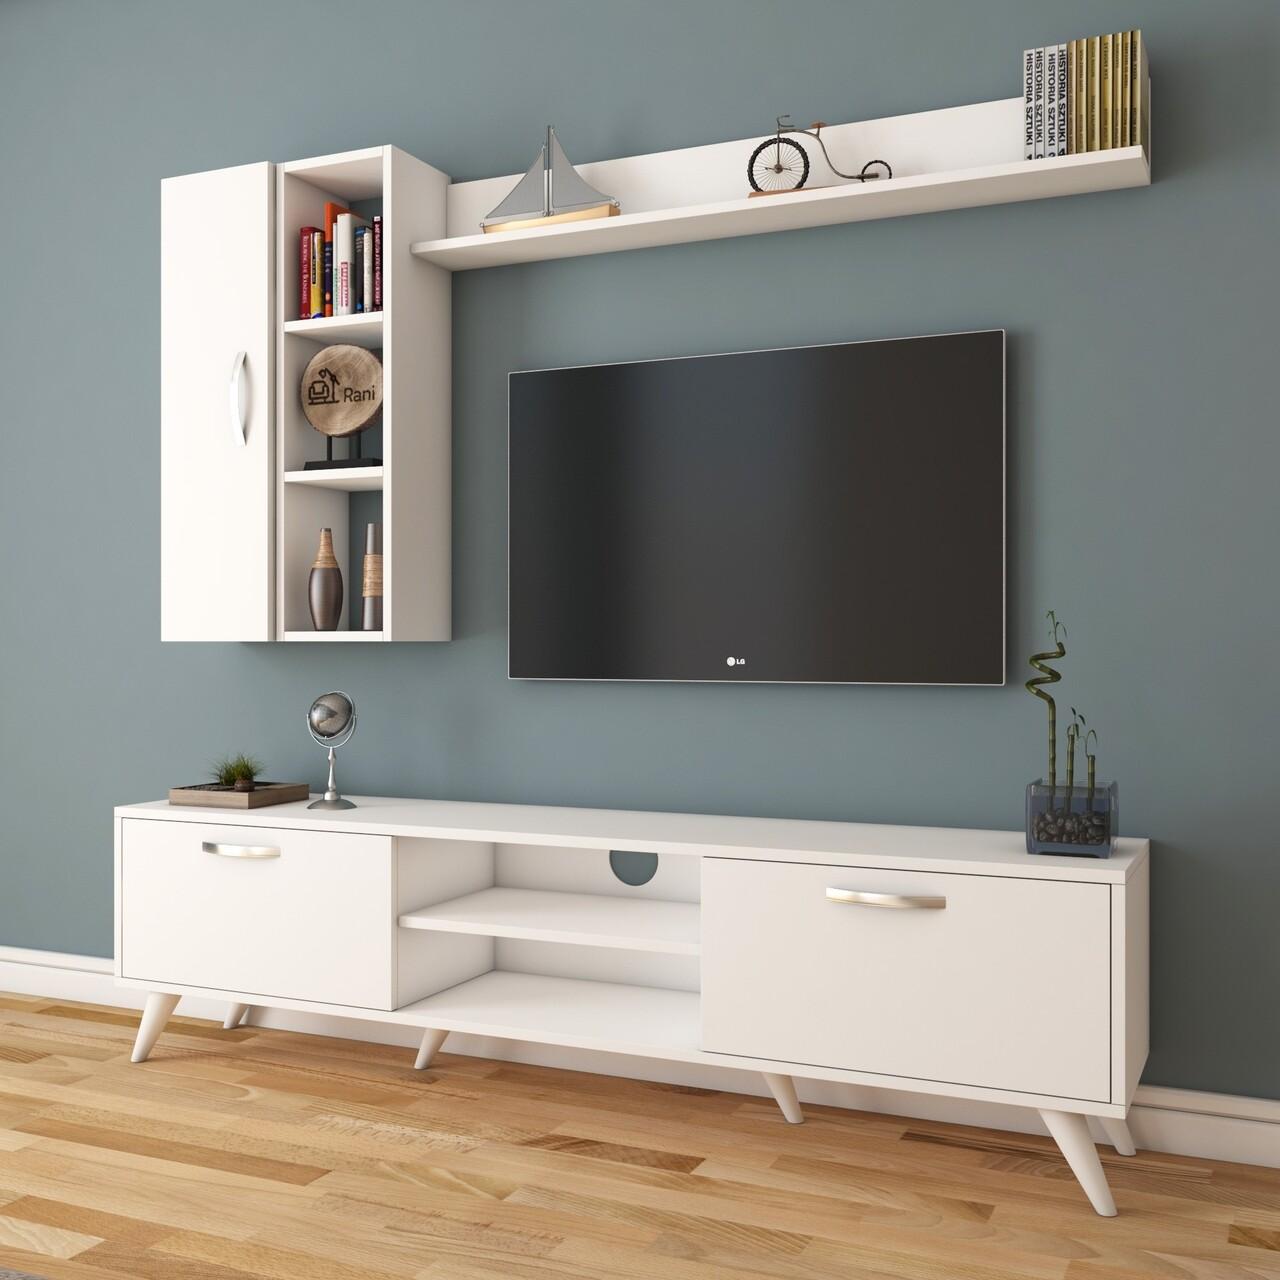 Comoda TV cu 2 rafturi de perete si cabinet M45 - 318, Wren, 180 x 35 x 48.6 cm/90 cm/133 cm, white